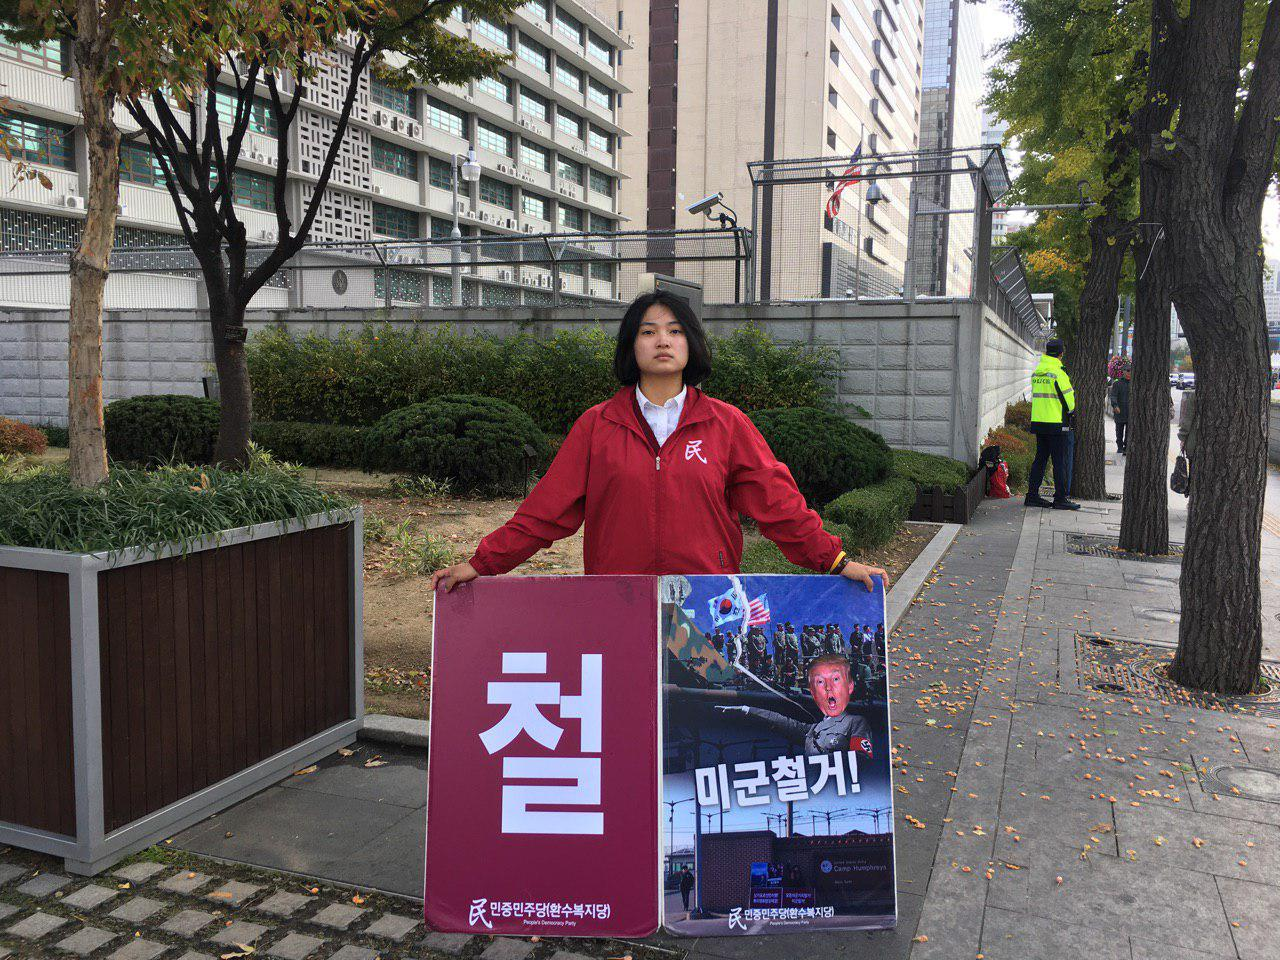 photo_2019-10-29_05-51-53.jpg